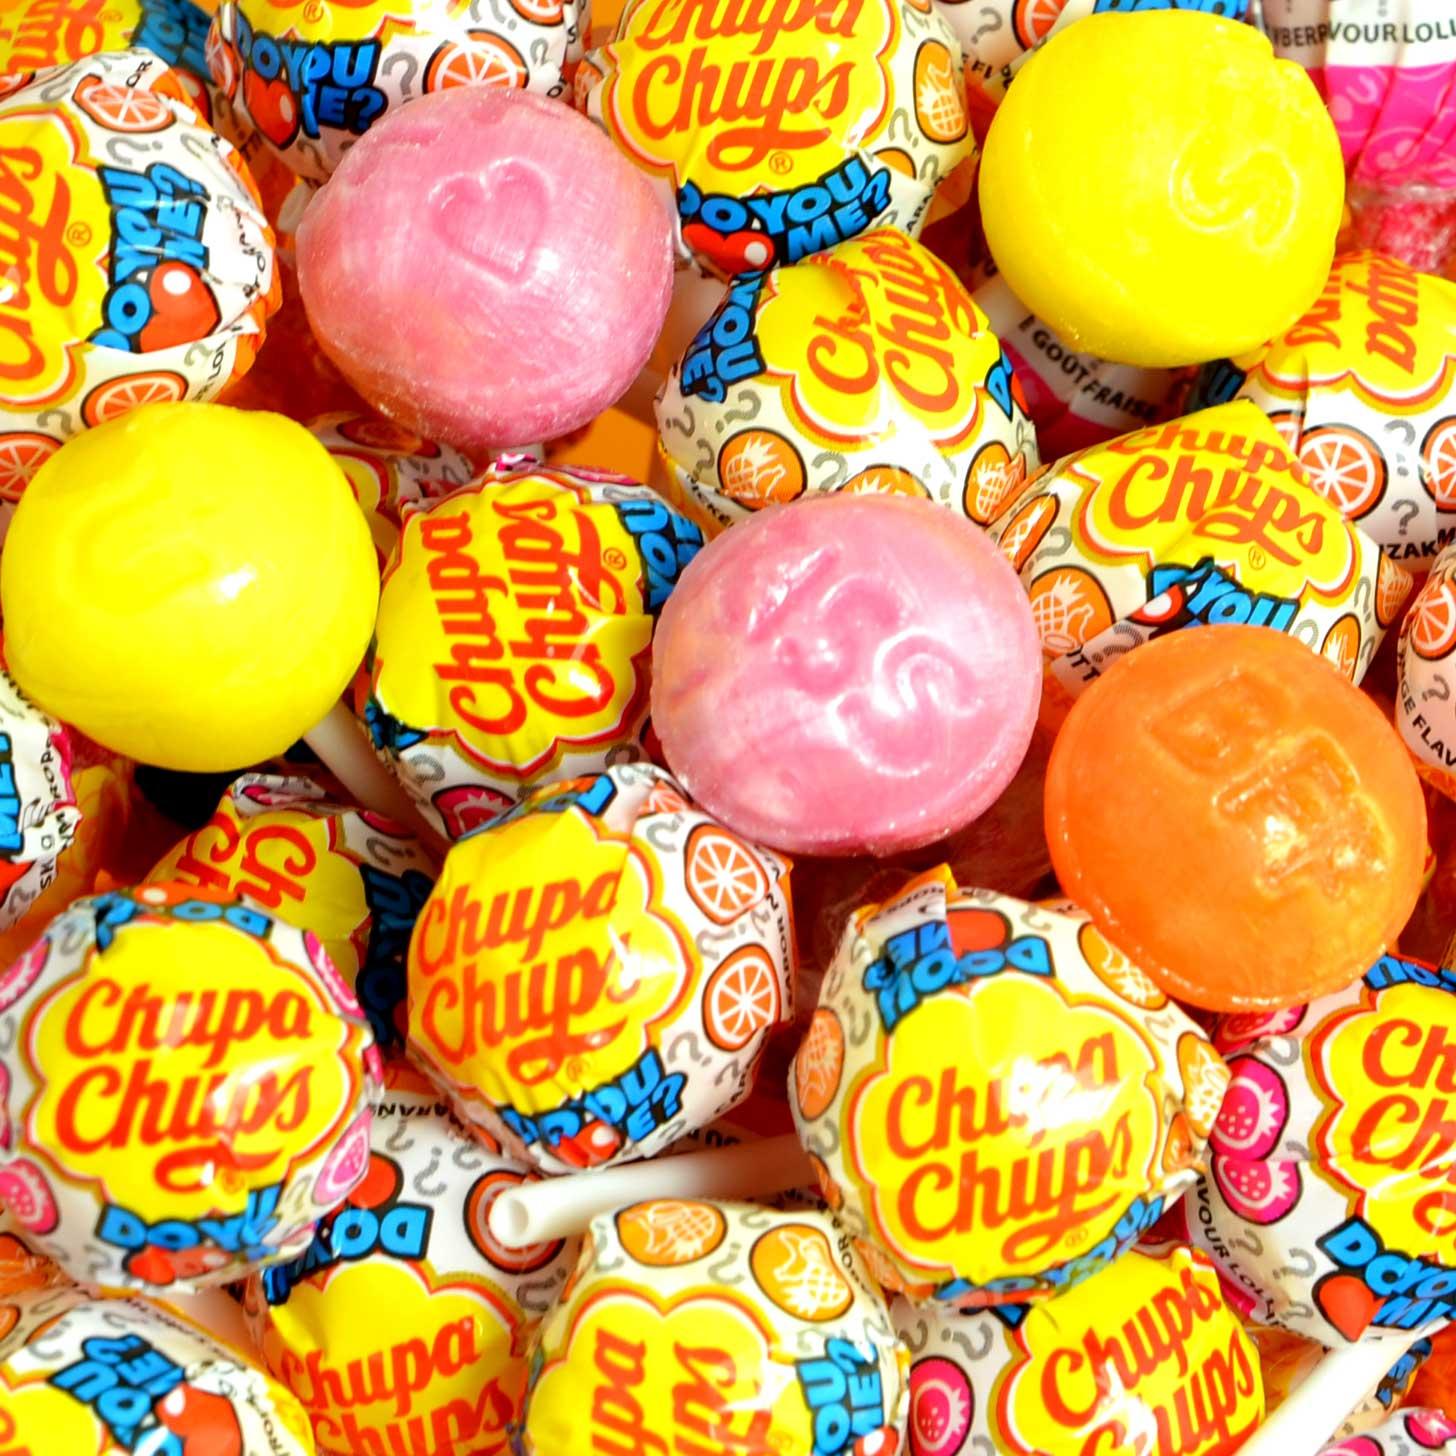 Chupa chups do you love me 100er online kaufen im world of sweets shop - Housse de couette chupa chups ...